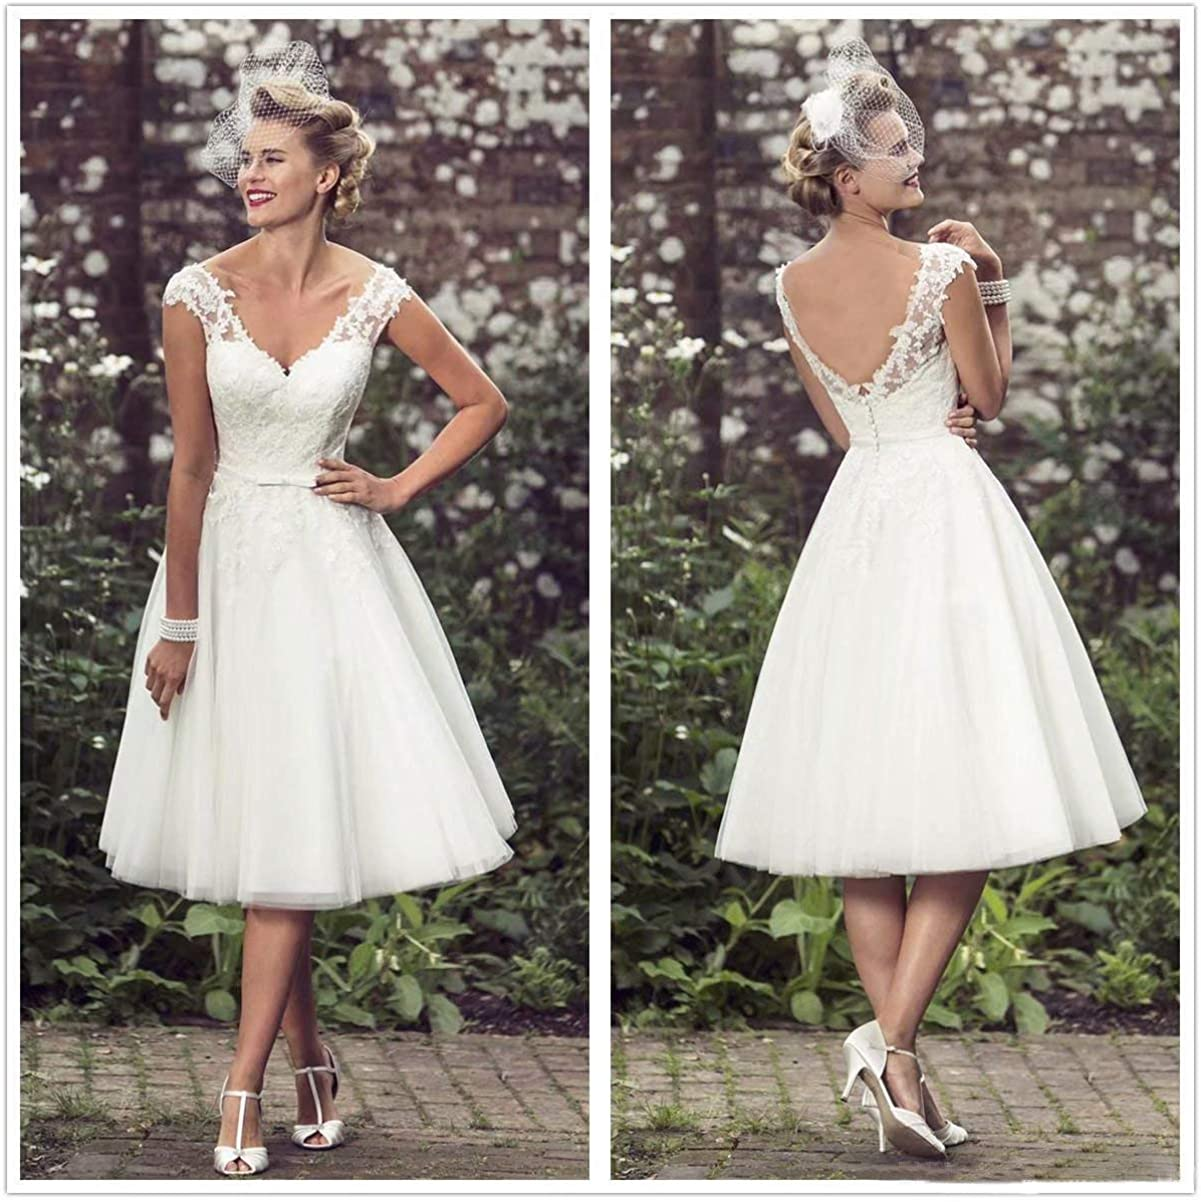 Princess Women's Vintage 20's Short Lace Wedding Dresses V Neck ...